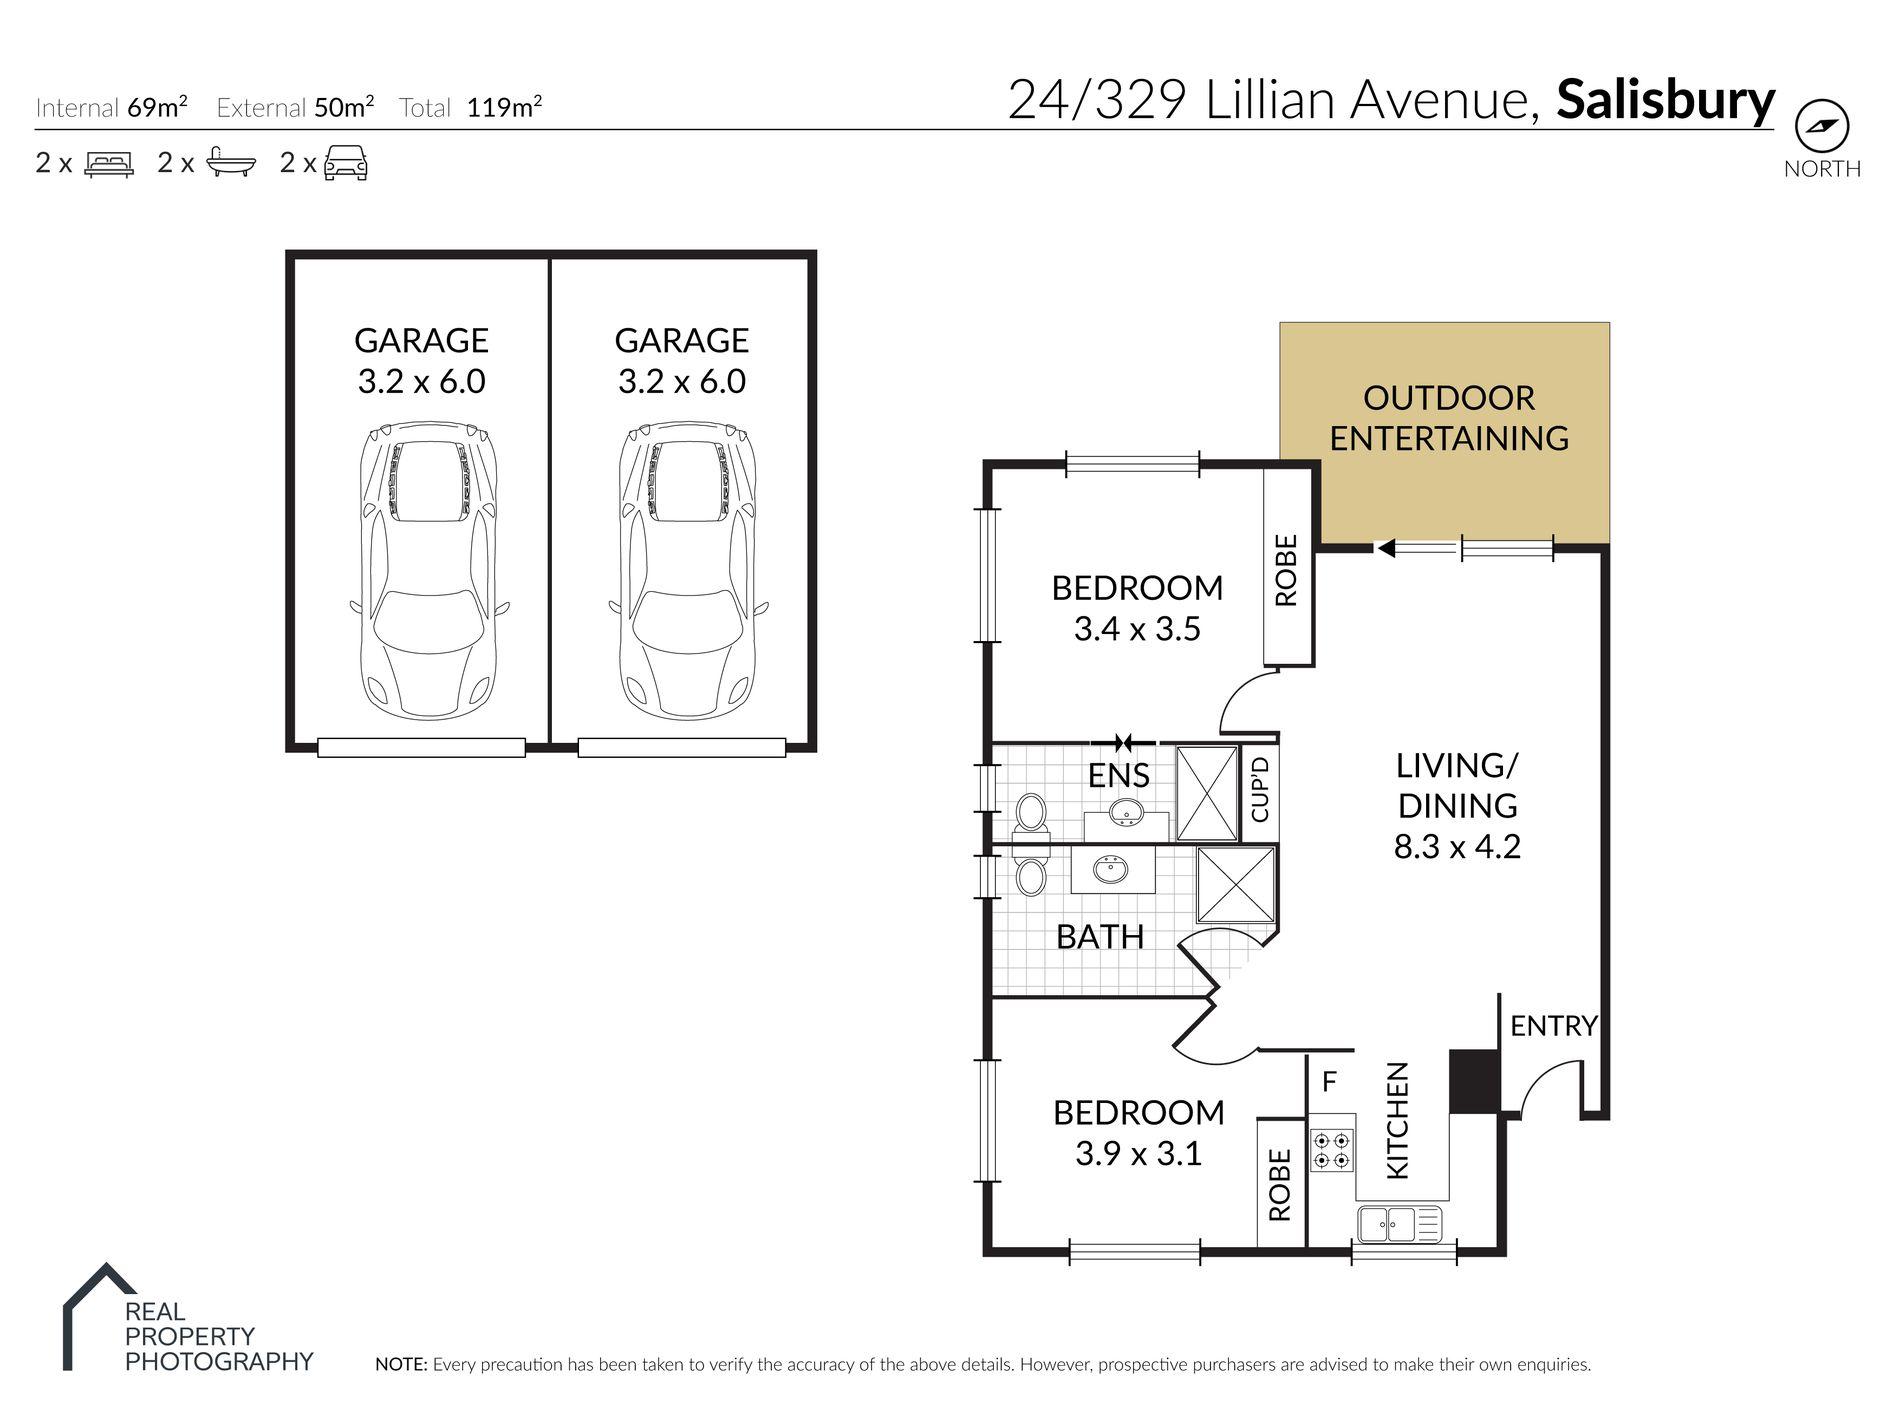 24 / 329 Lillian Avenue, Salisbury